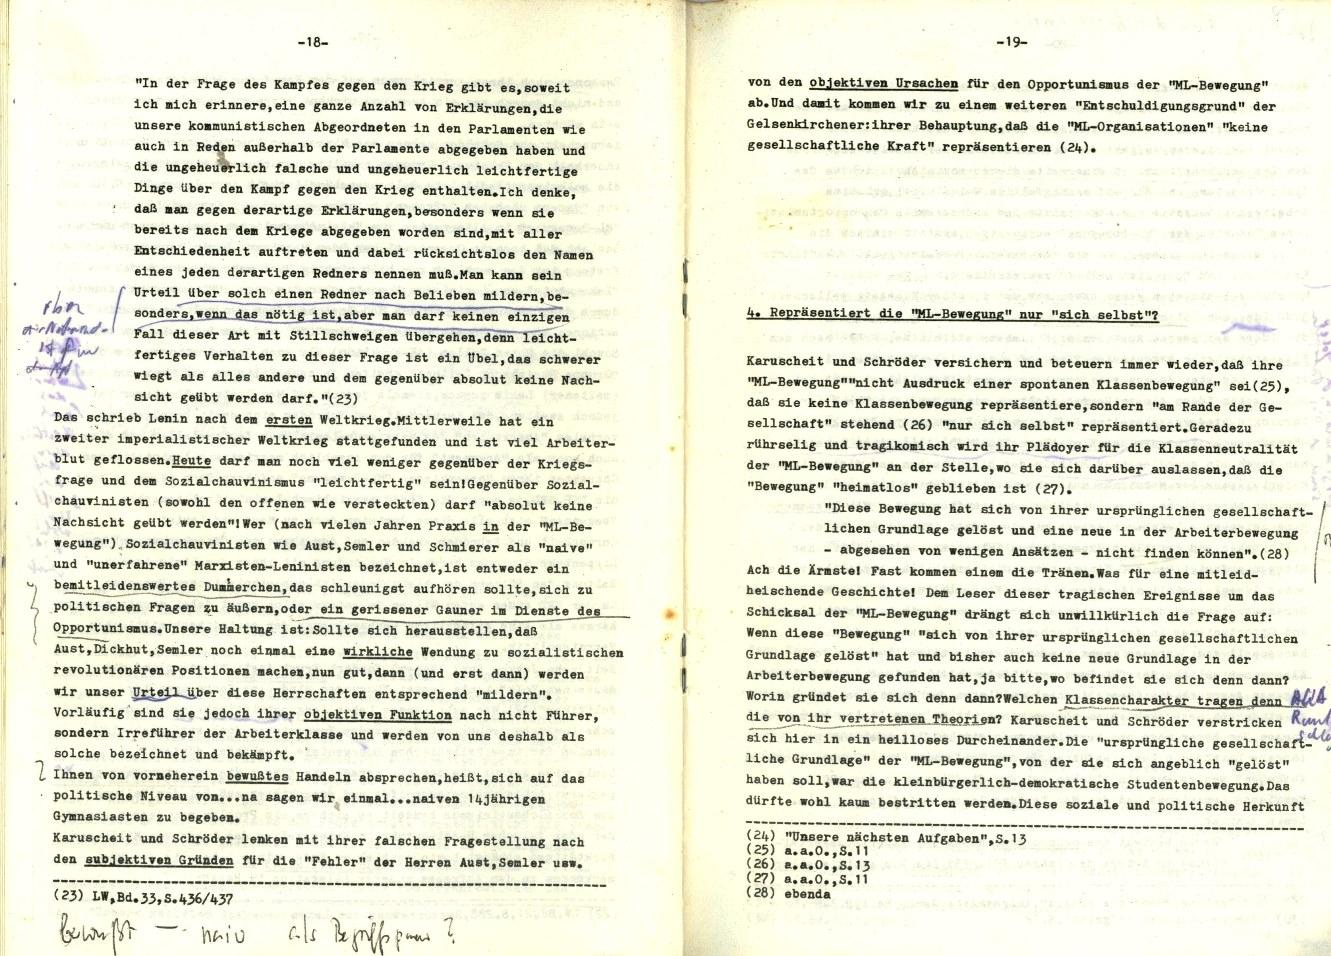 Muenchen_Kampf_dem_Revisionismus_1978_07_10